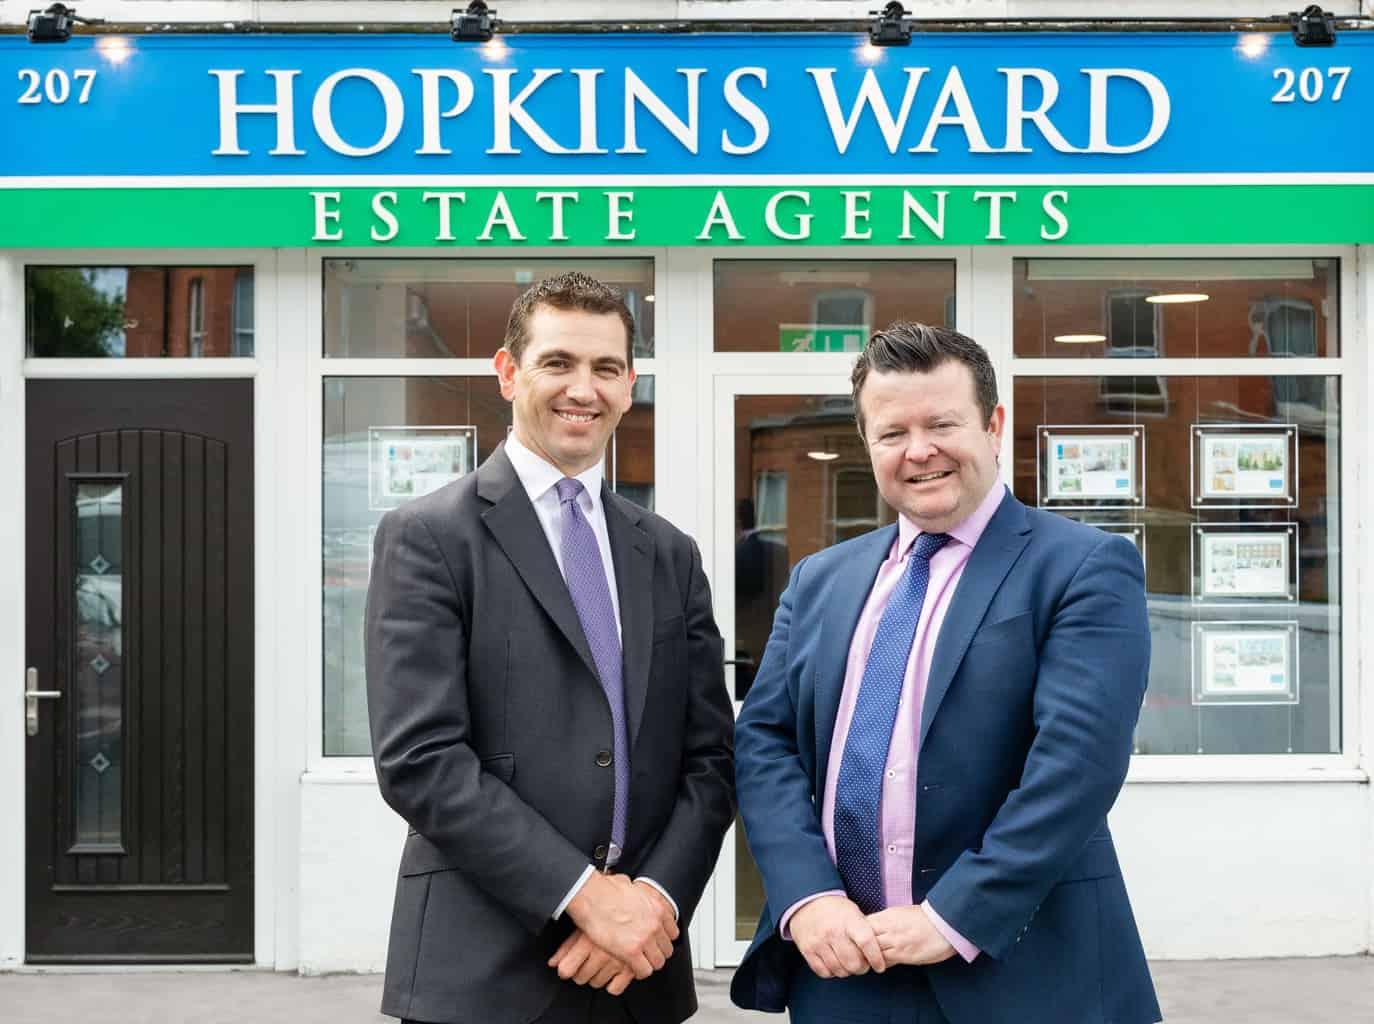 Who are Hopkins Ward?